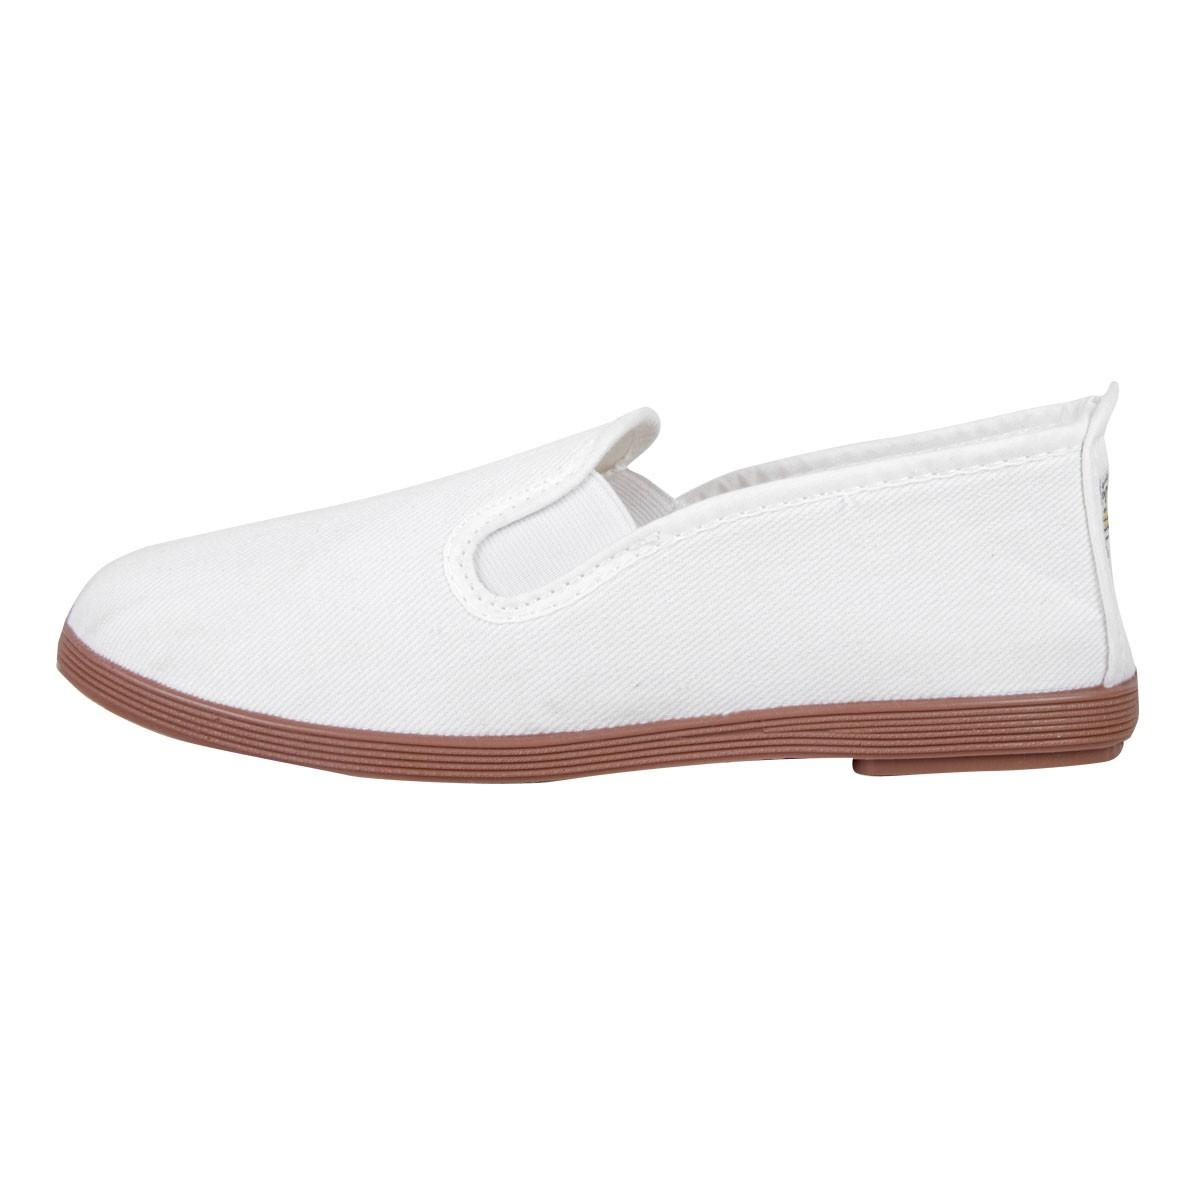 Fuji Mae Zapatilla para Wu Shu color blanco